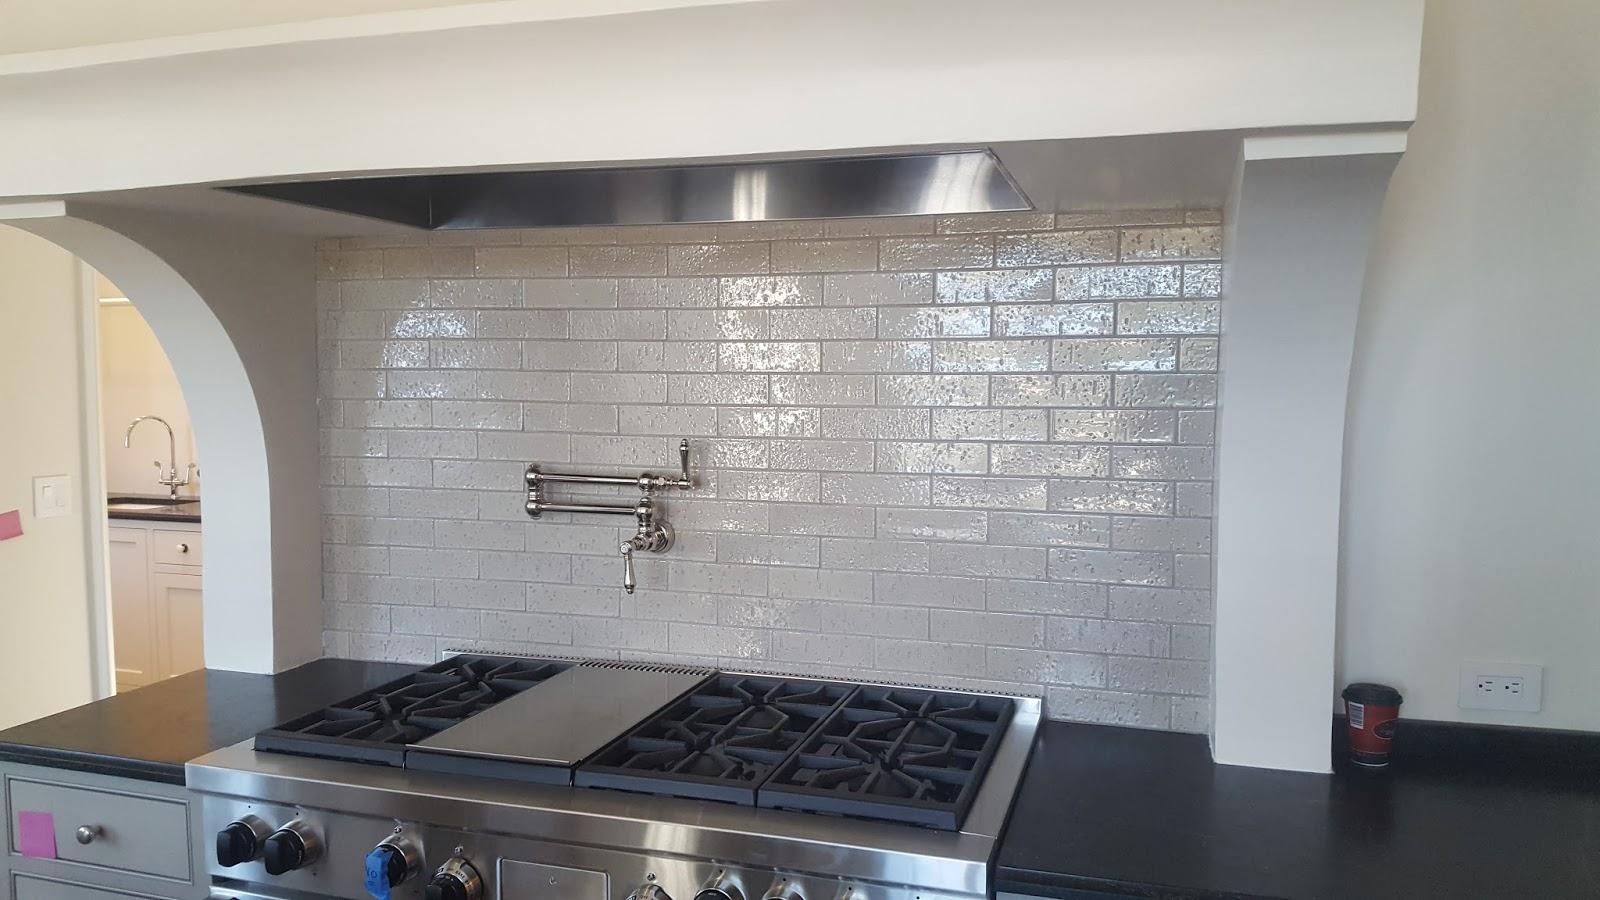 2017 Kitchen Backsplash Trends Kennedy Kitchens Baths